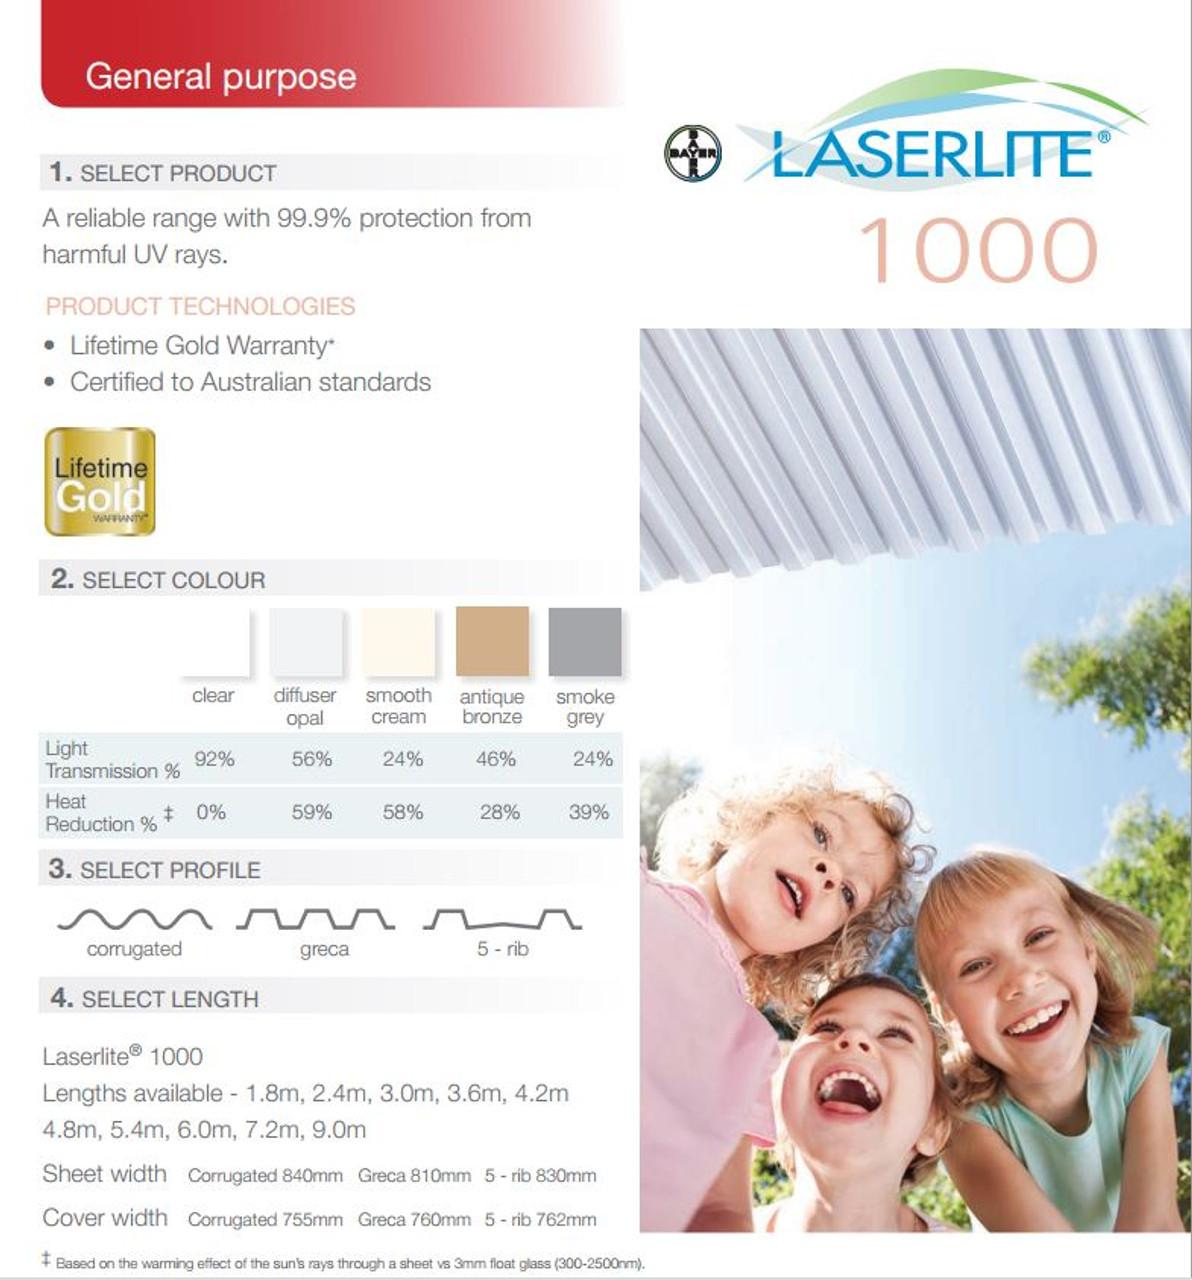 Laserlite 1000 5-Rib Polycarb Roofing Standard per L/M